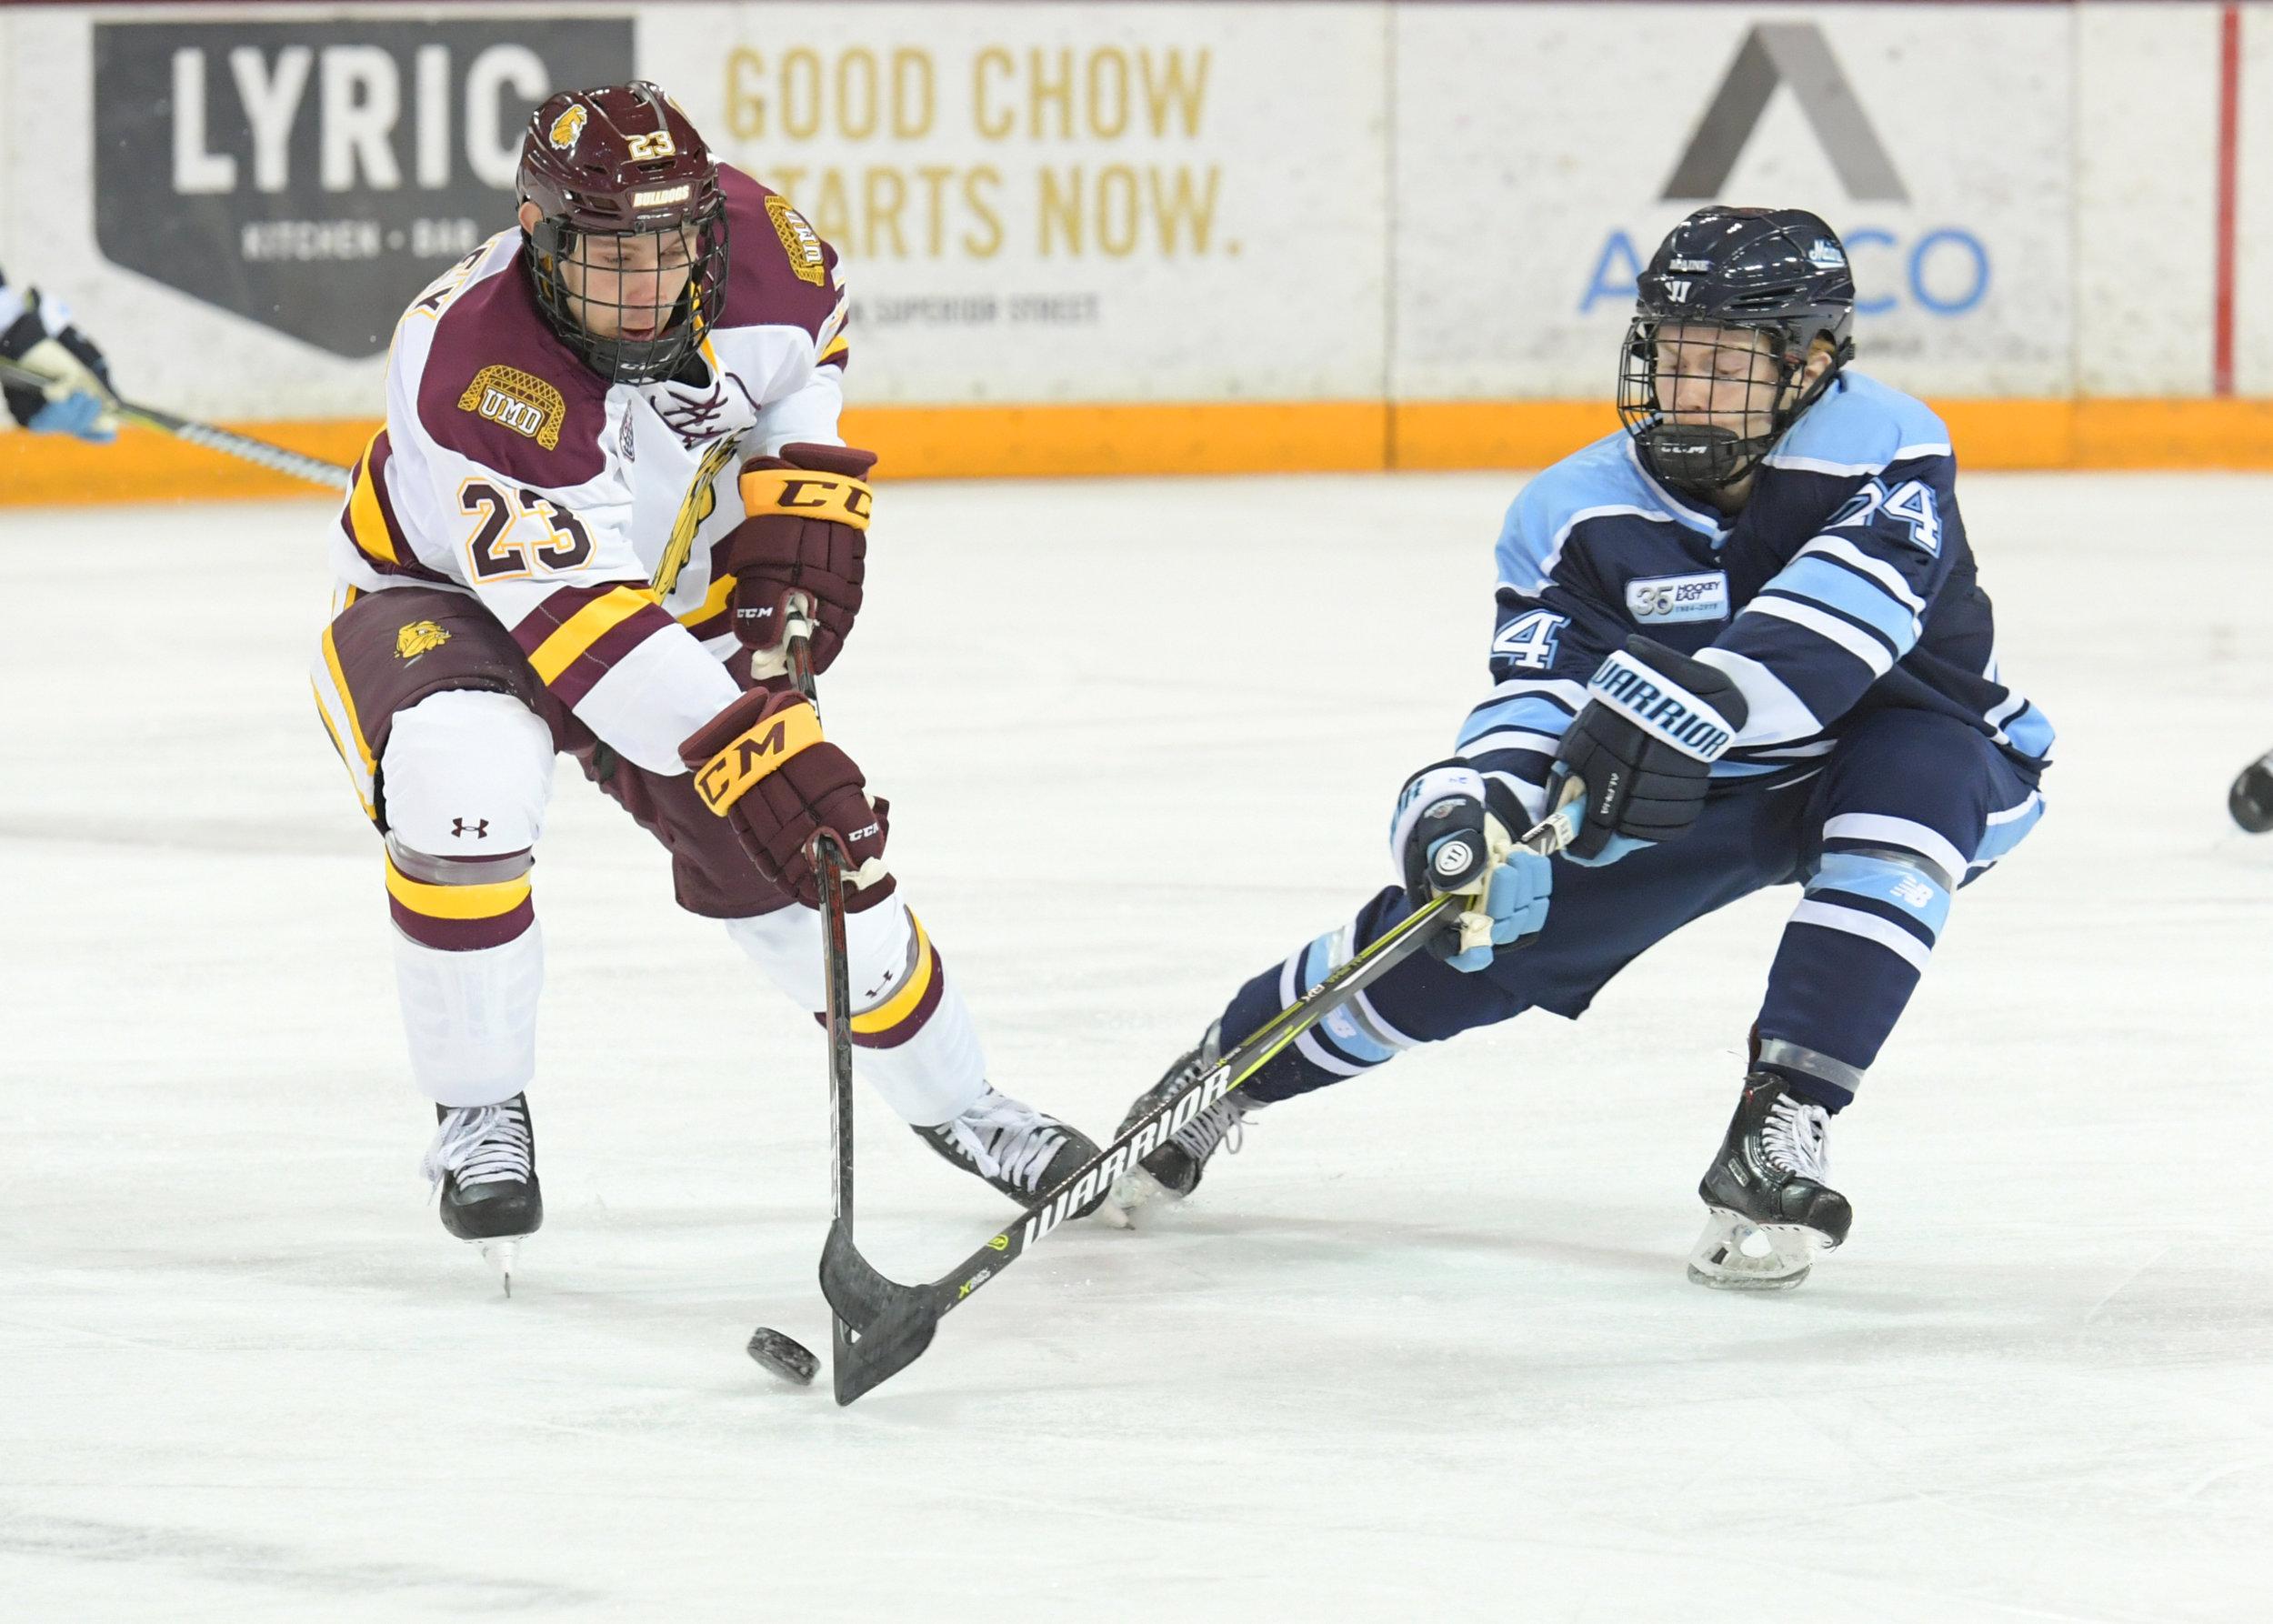 Sophomore Nick Swaney battles the Black Bears down the ice. Photo courtesy of UMD Athletics